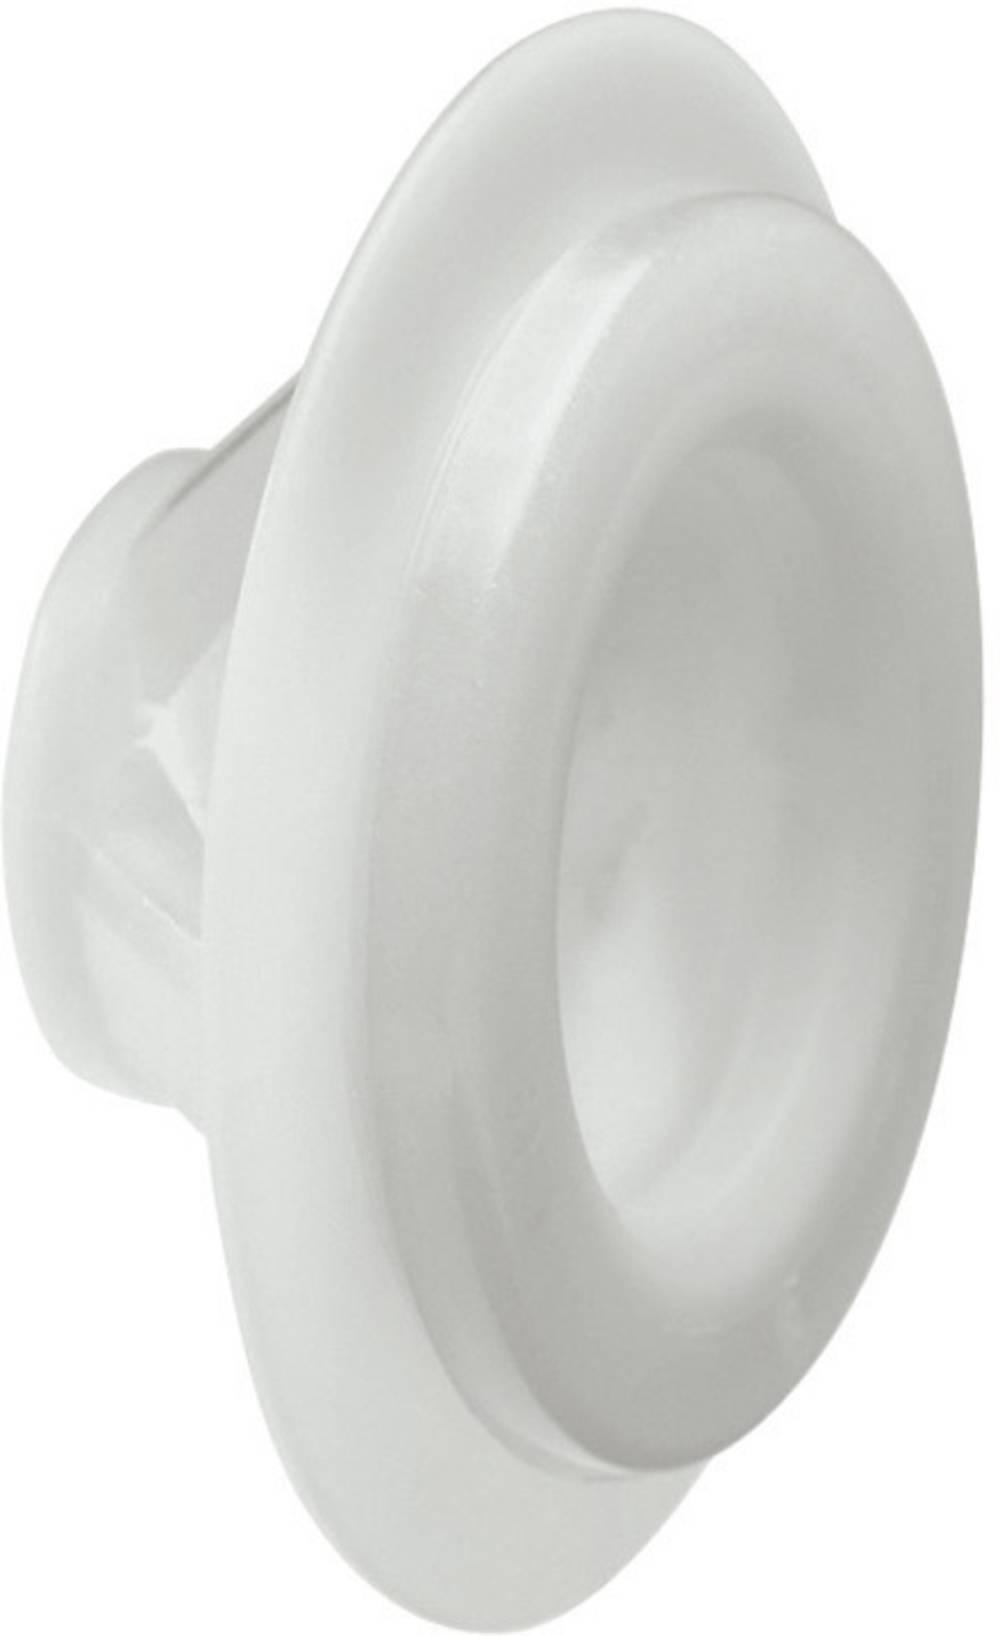 Kabelska uvodnica, promjer sponke (maks.) 10 mm poliamid, TPE (posebna gumijeva zmes neutralnog vonja) svijetlo sive boje (RAL 7